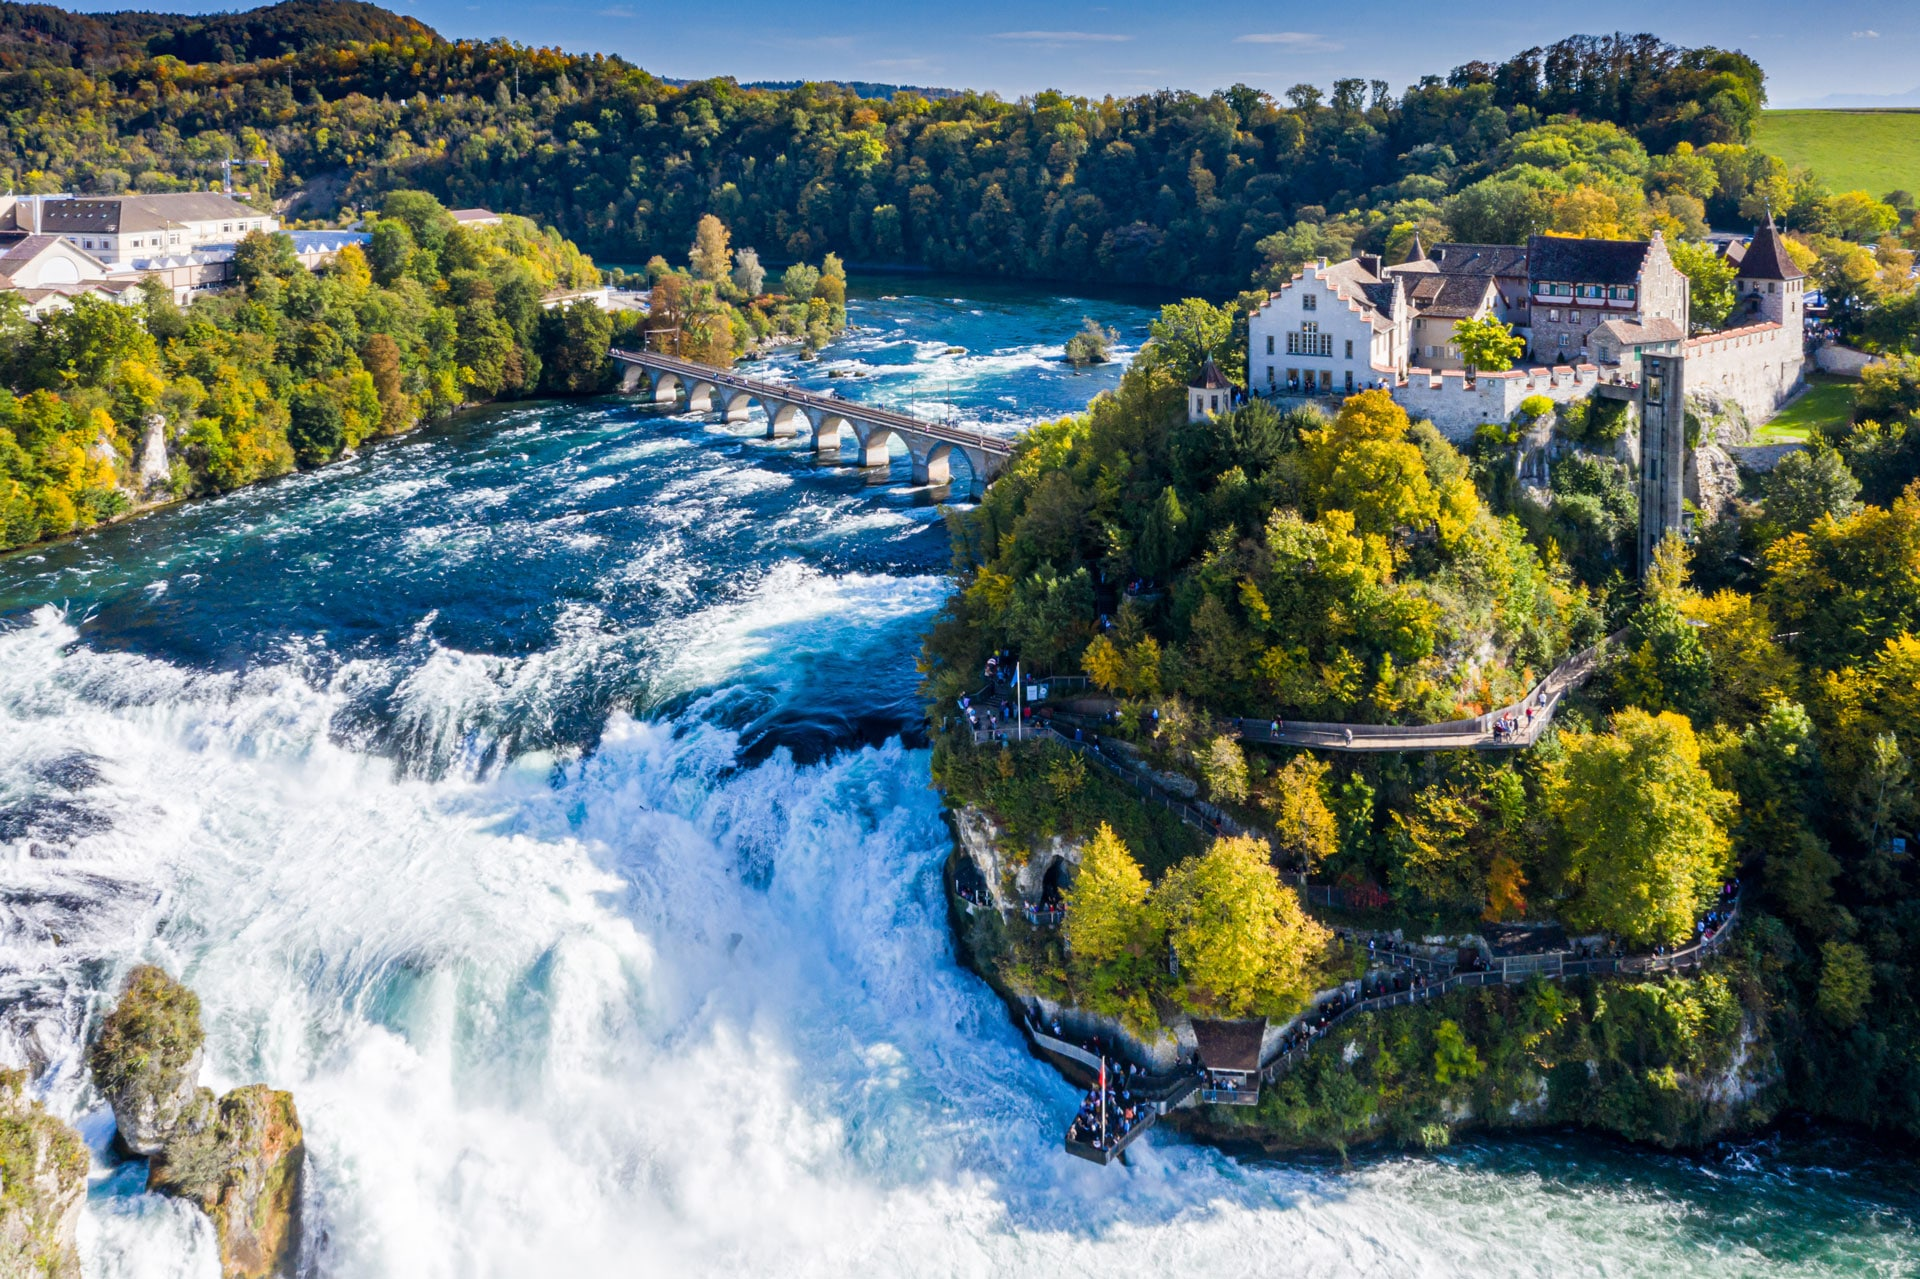 Wisata Eropa - Rhine Falls (tiqets)